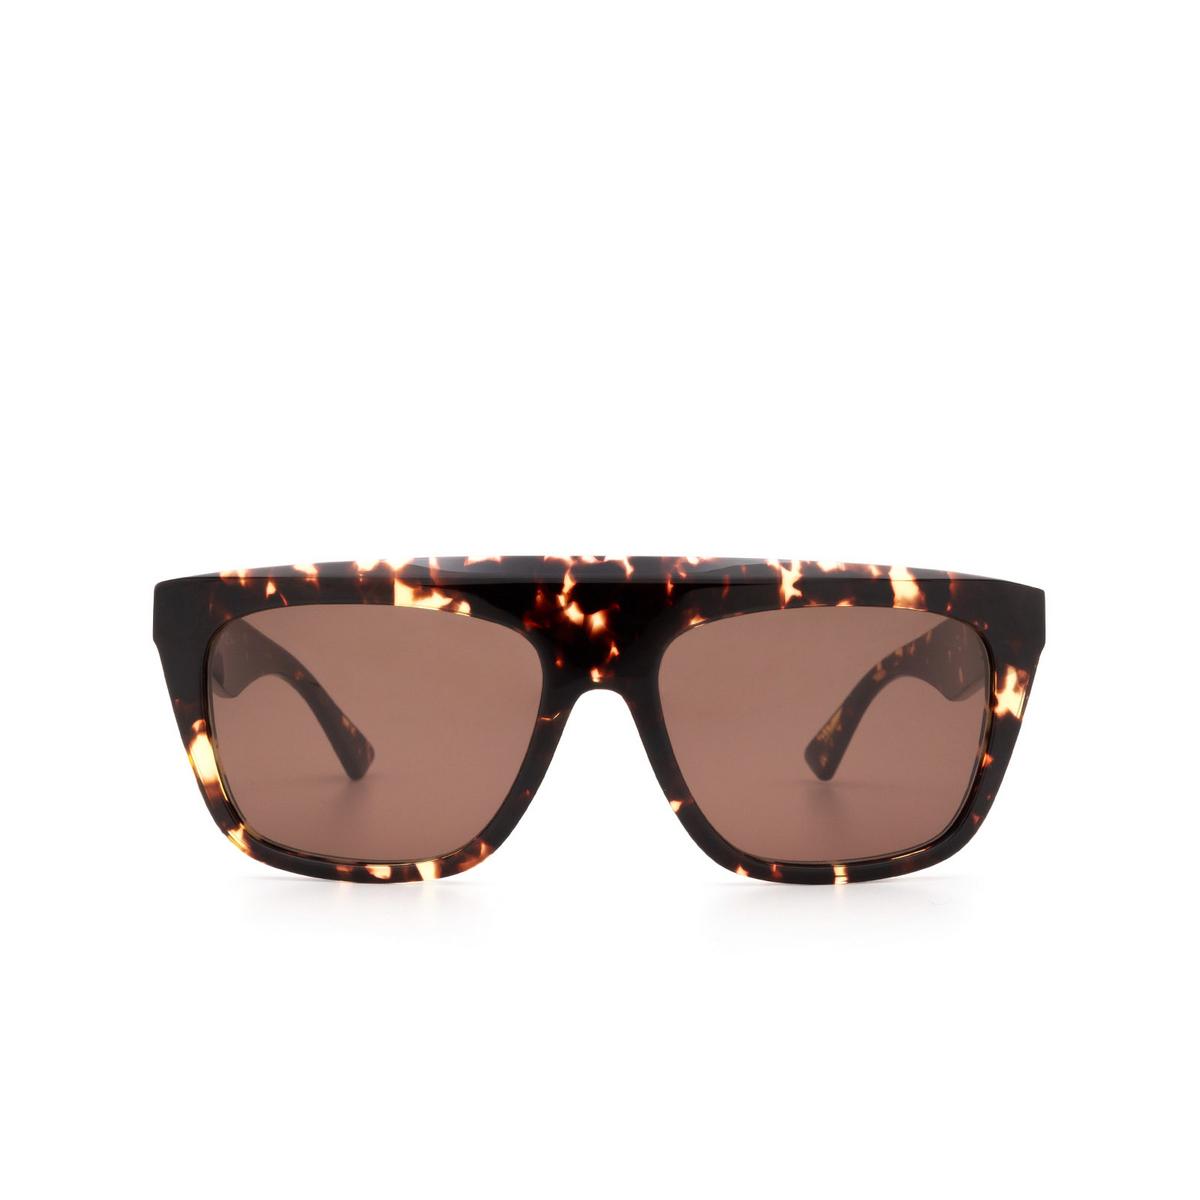 Bottega Veneta® Square Sunglasses: BV1060S color Havana 002.